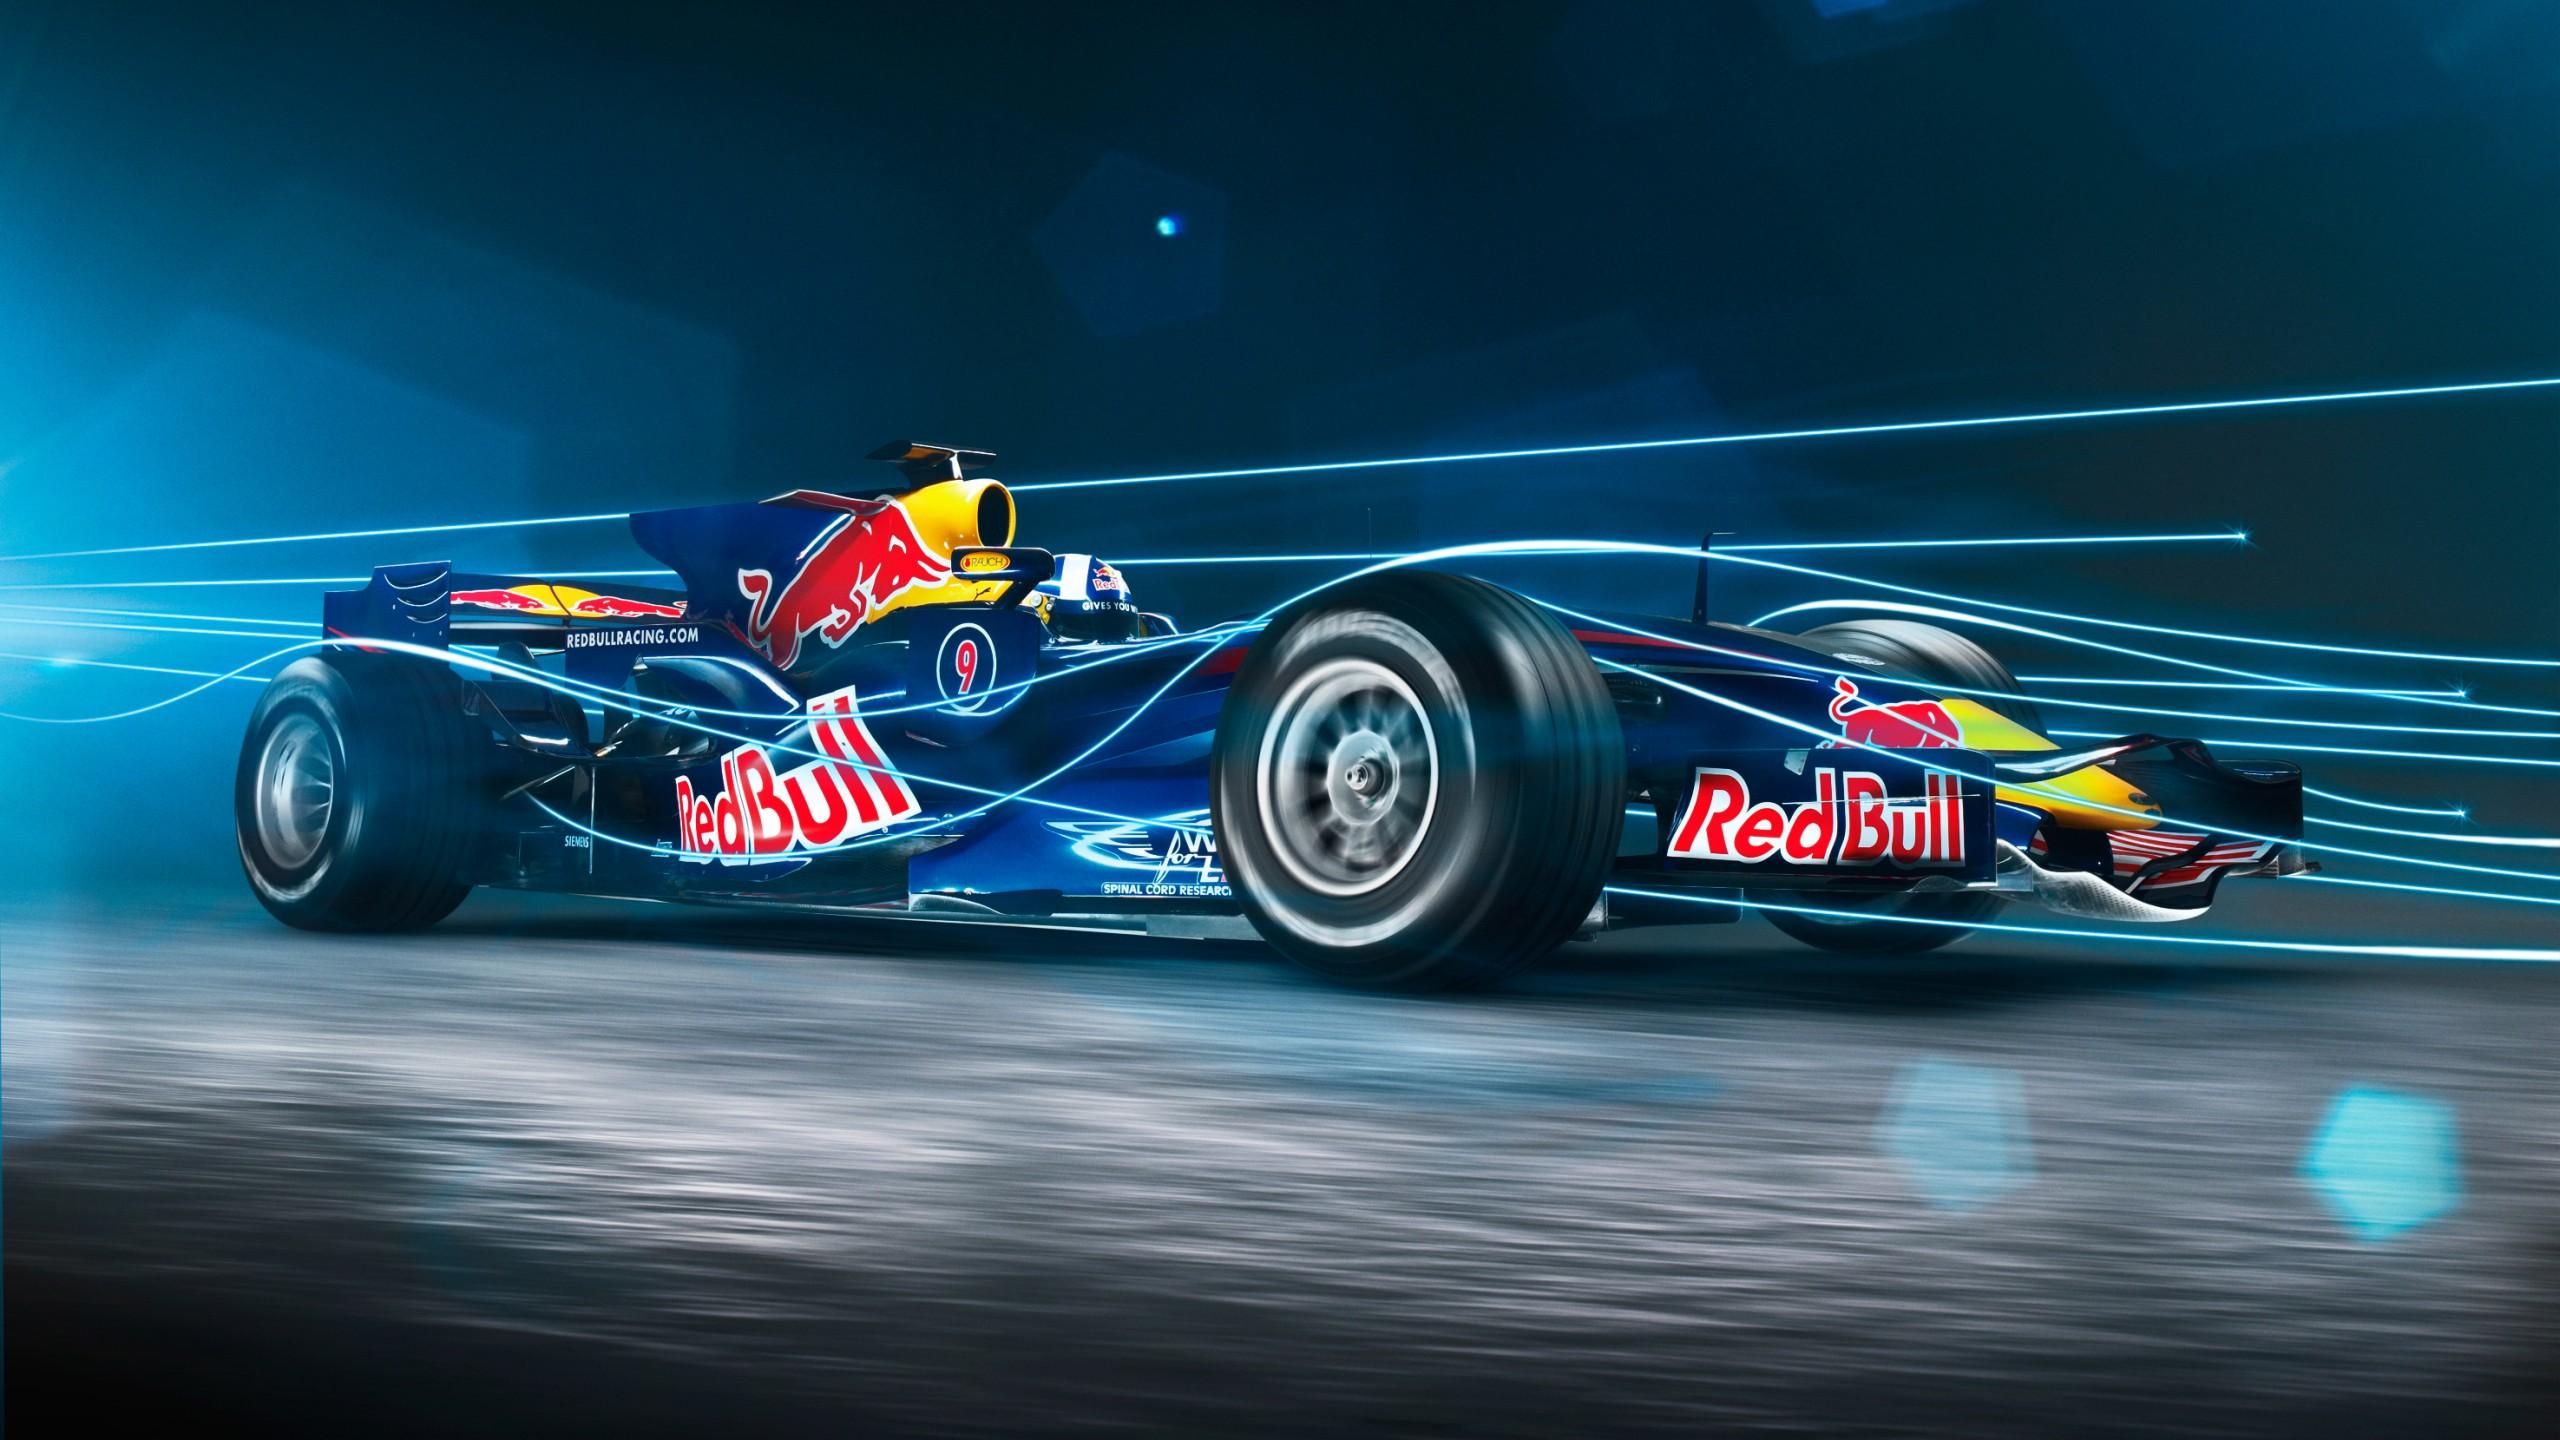 Mazda Race Car Wallpaper Red Bull Racing F1 Hd Wallpaper Hd Car Wallpapers Id 8031